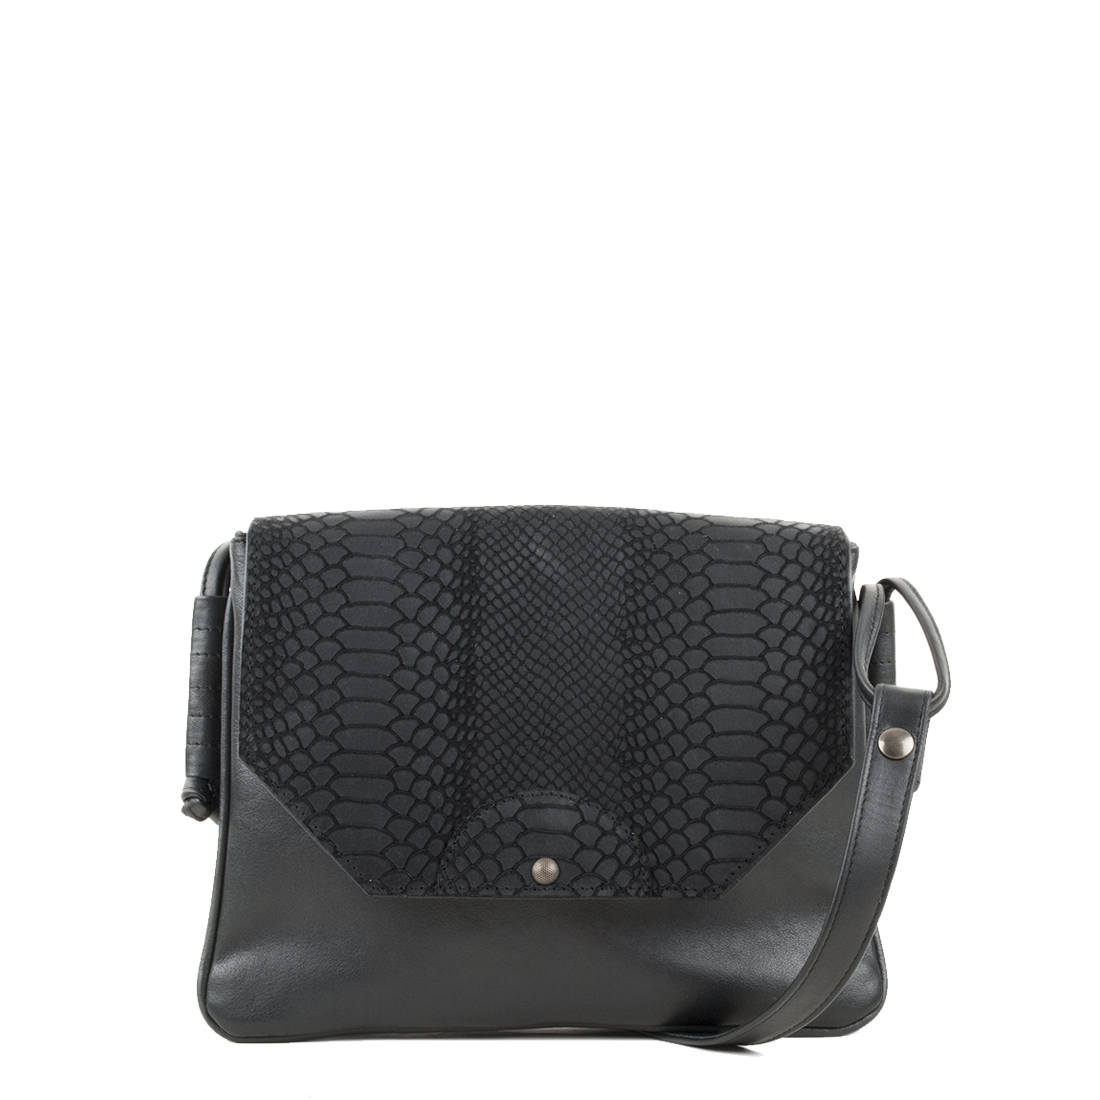 Annie Black Anaconda Satchel Bag